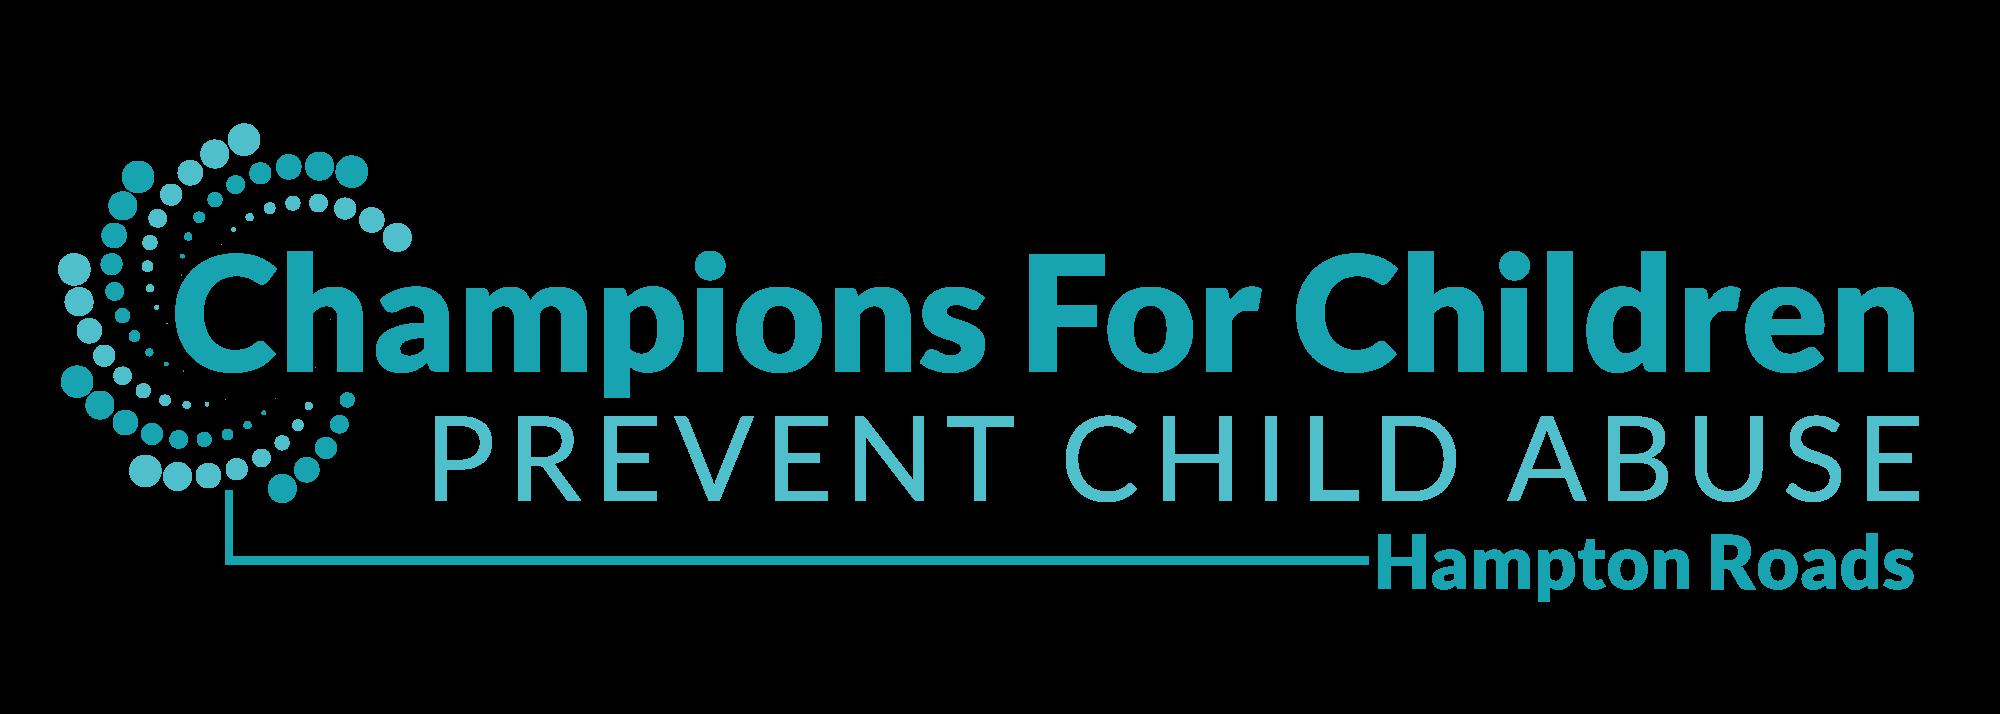 Champions For Children Hampton Roads (Norfolk, VA)